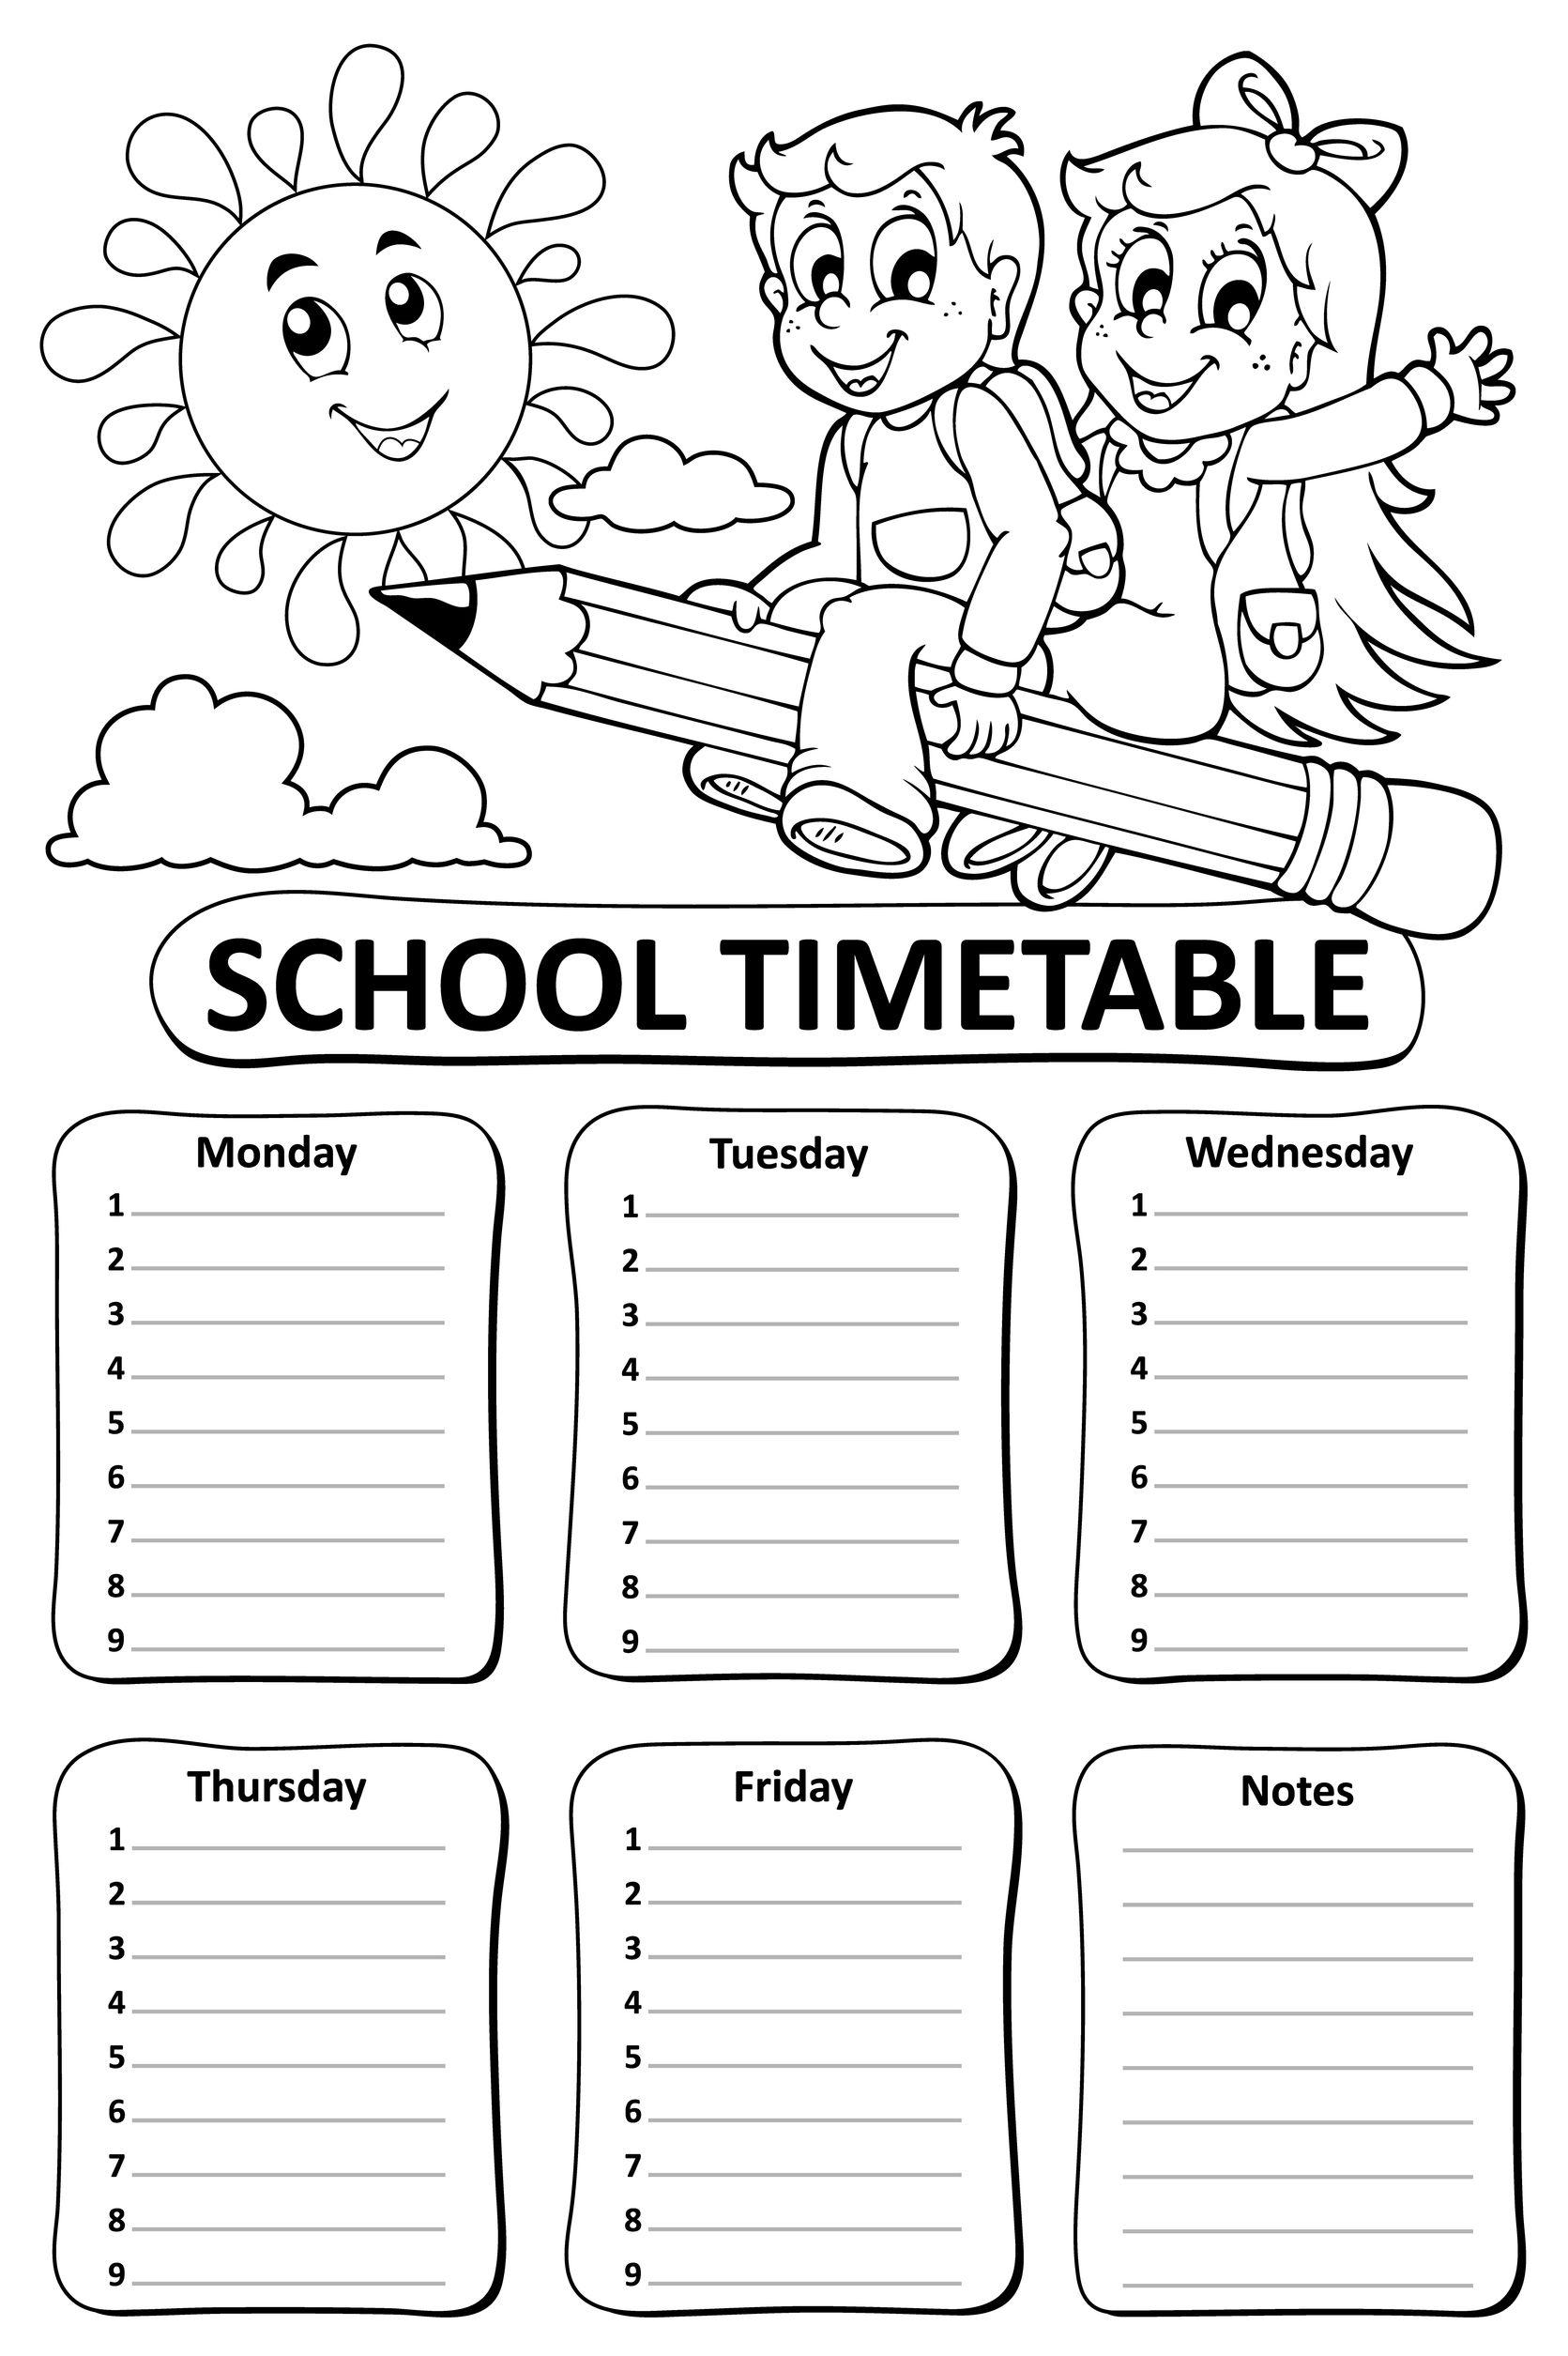 60233187 - black and white school timetable theme